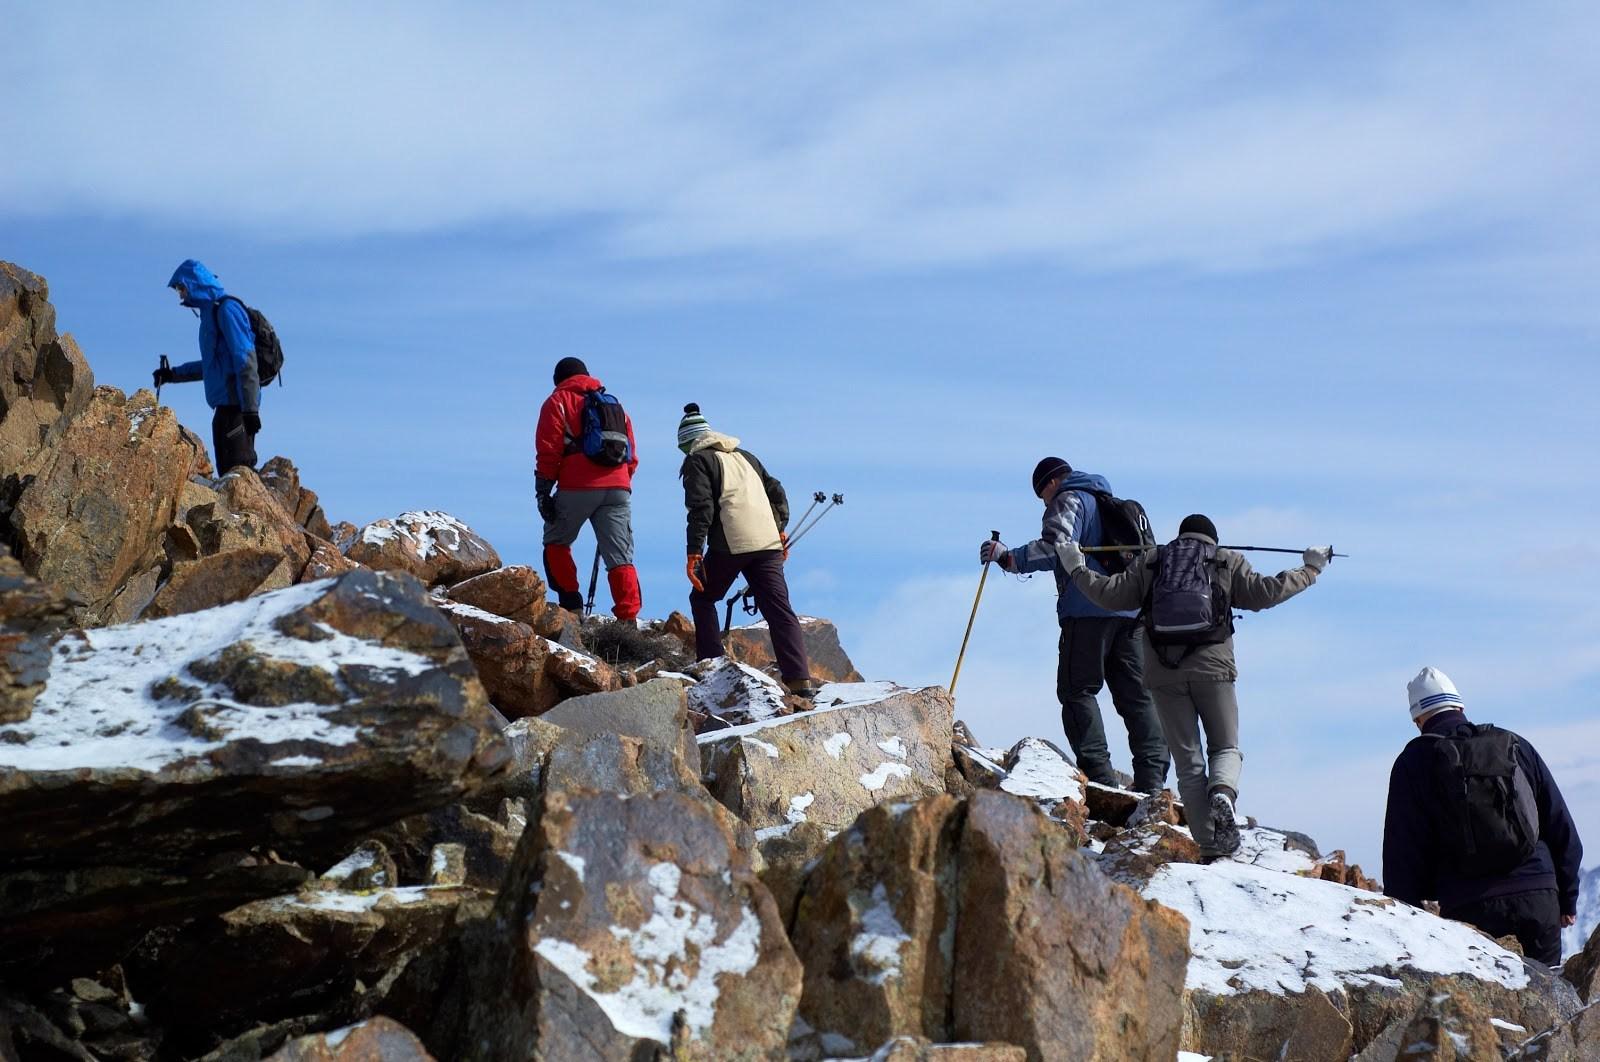 competent mountain climbing - mountain climbing